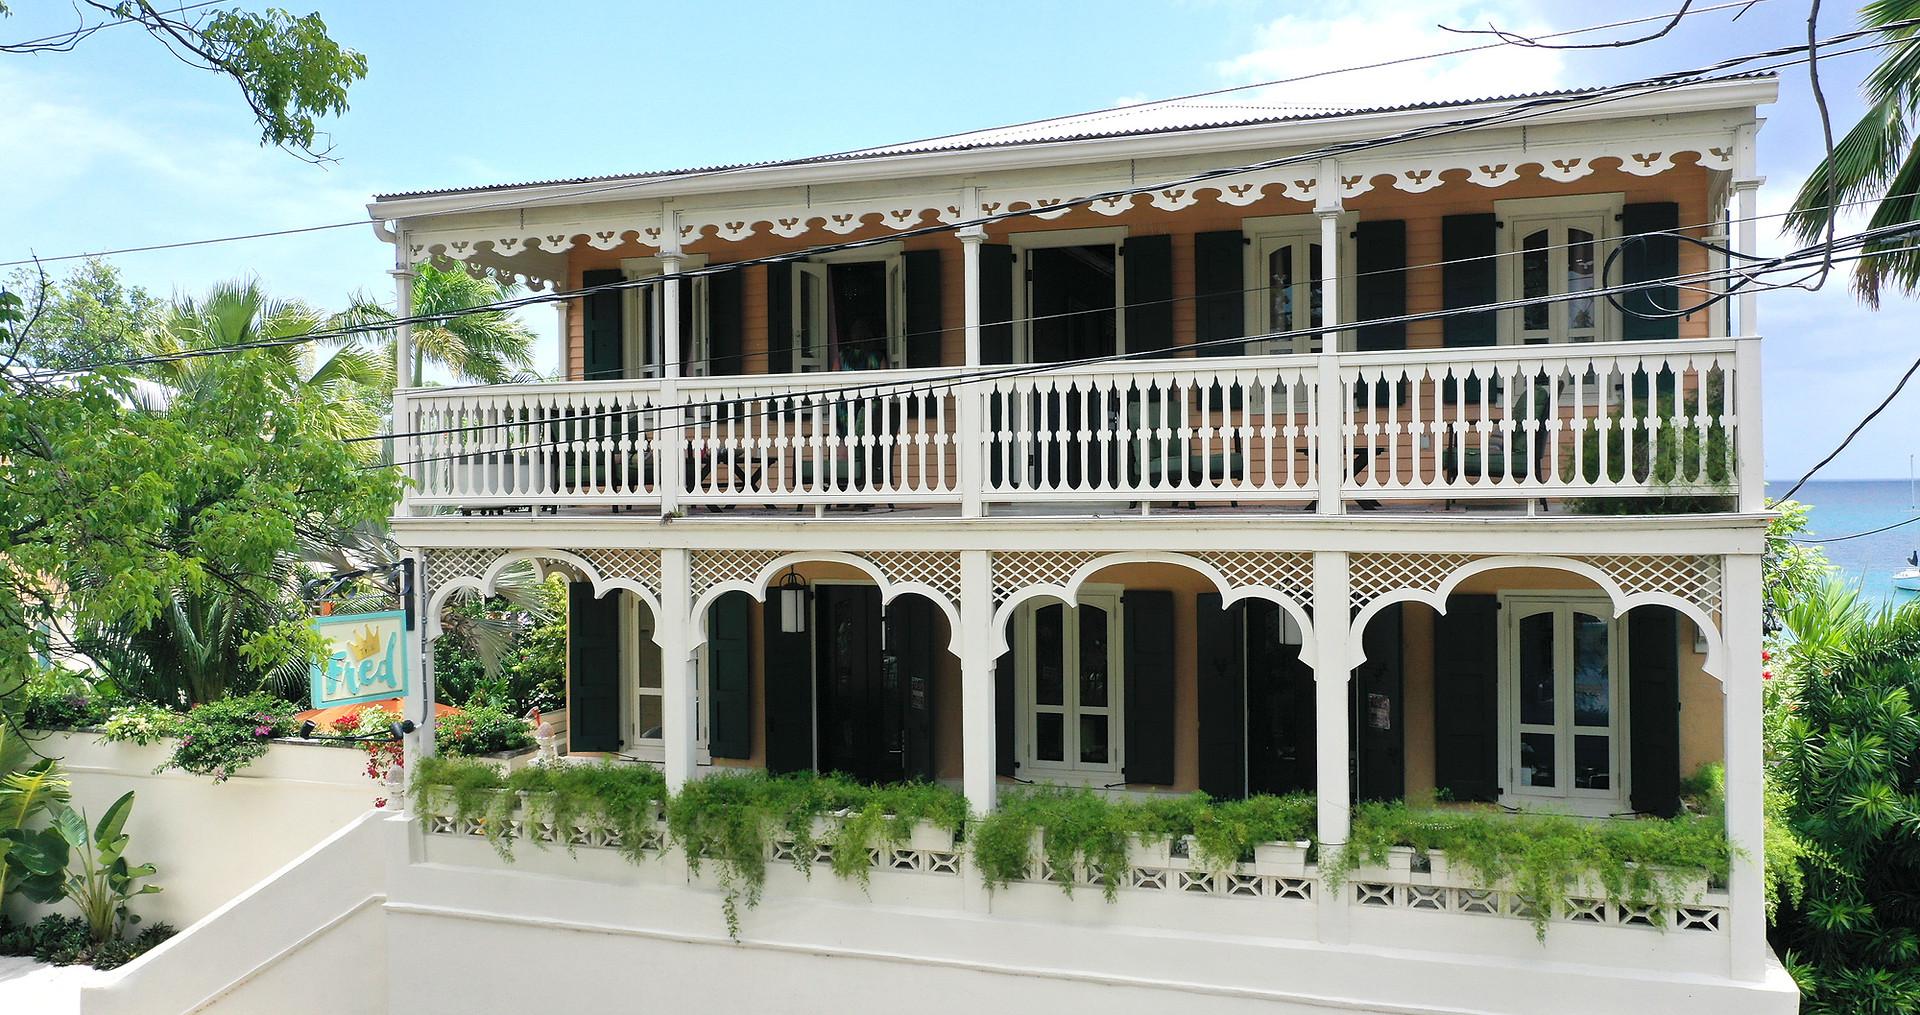 Main Entrance and Historic Landmark